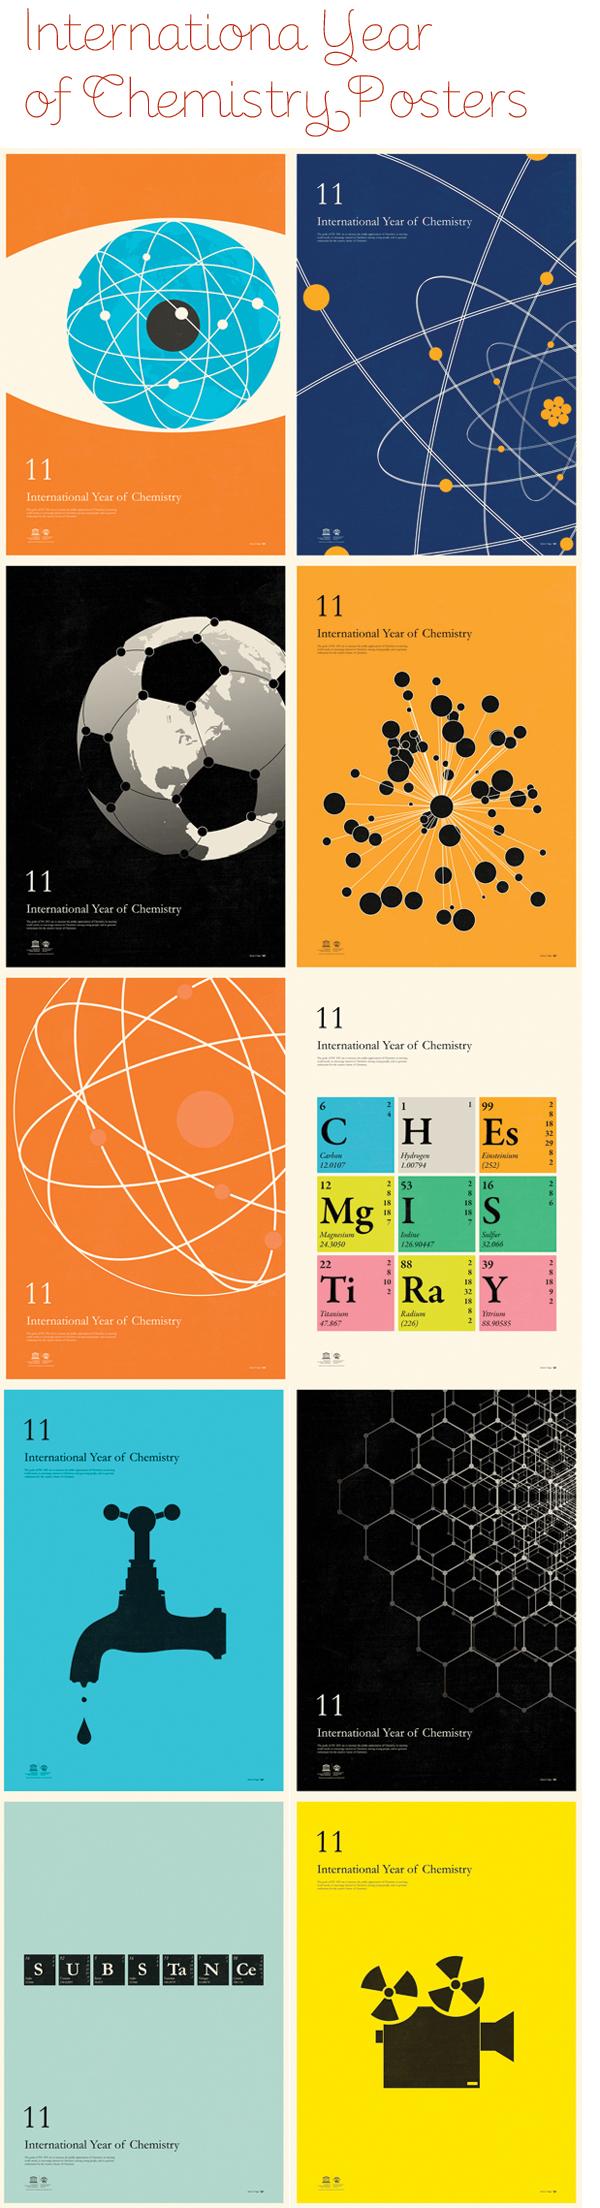 international-year-of-chemistry